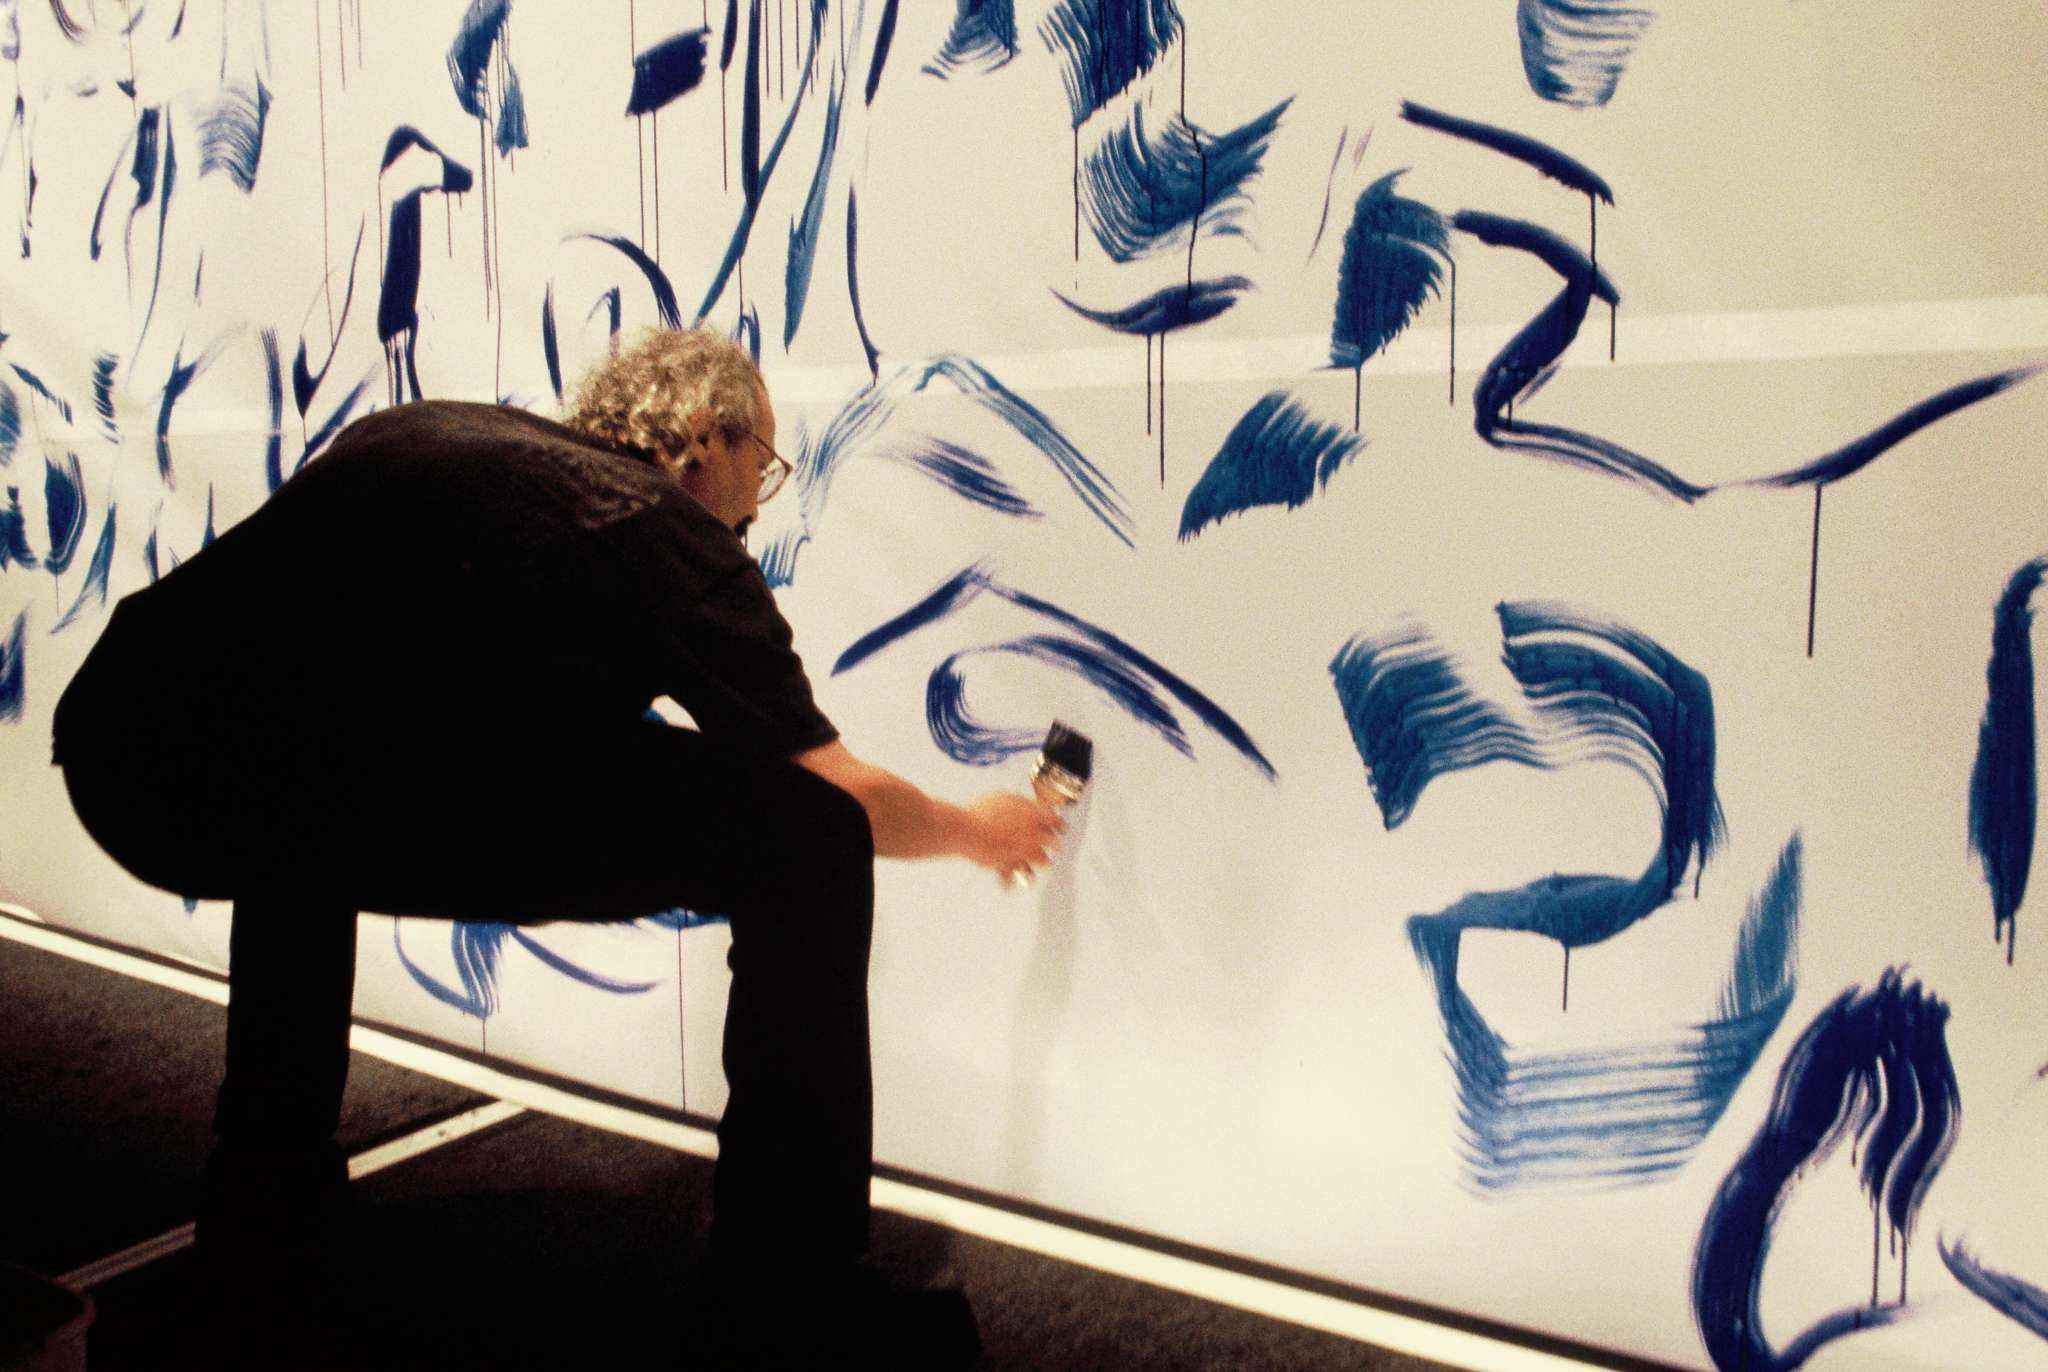 12-mahjoub-ben-bella-peinture-realisee-lors-du-sepctacle-signature-ballet-du-nord-1993